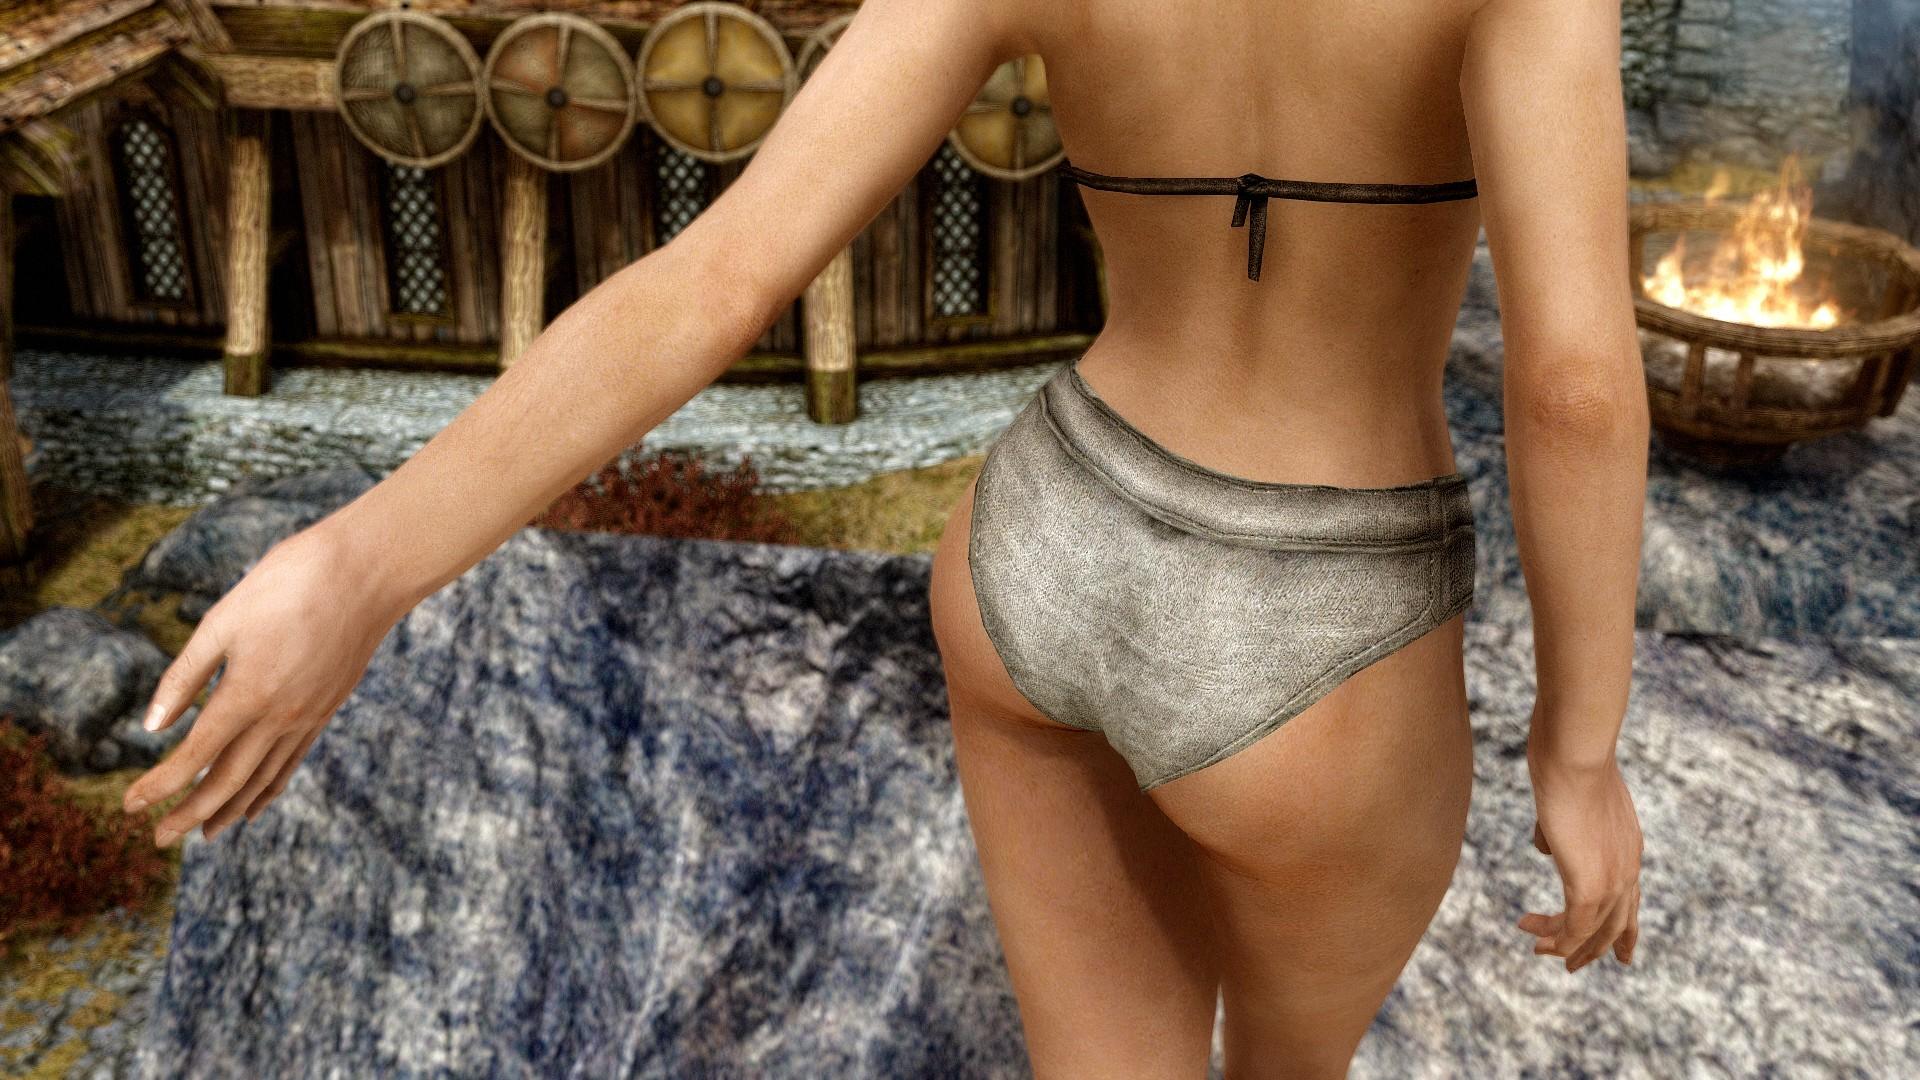 Elder Scrolls V Skyrim Screenshot 2017.09.20 - 02.33.33.83